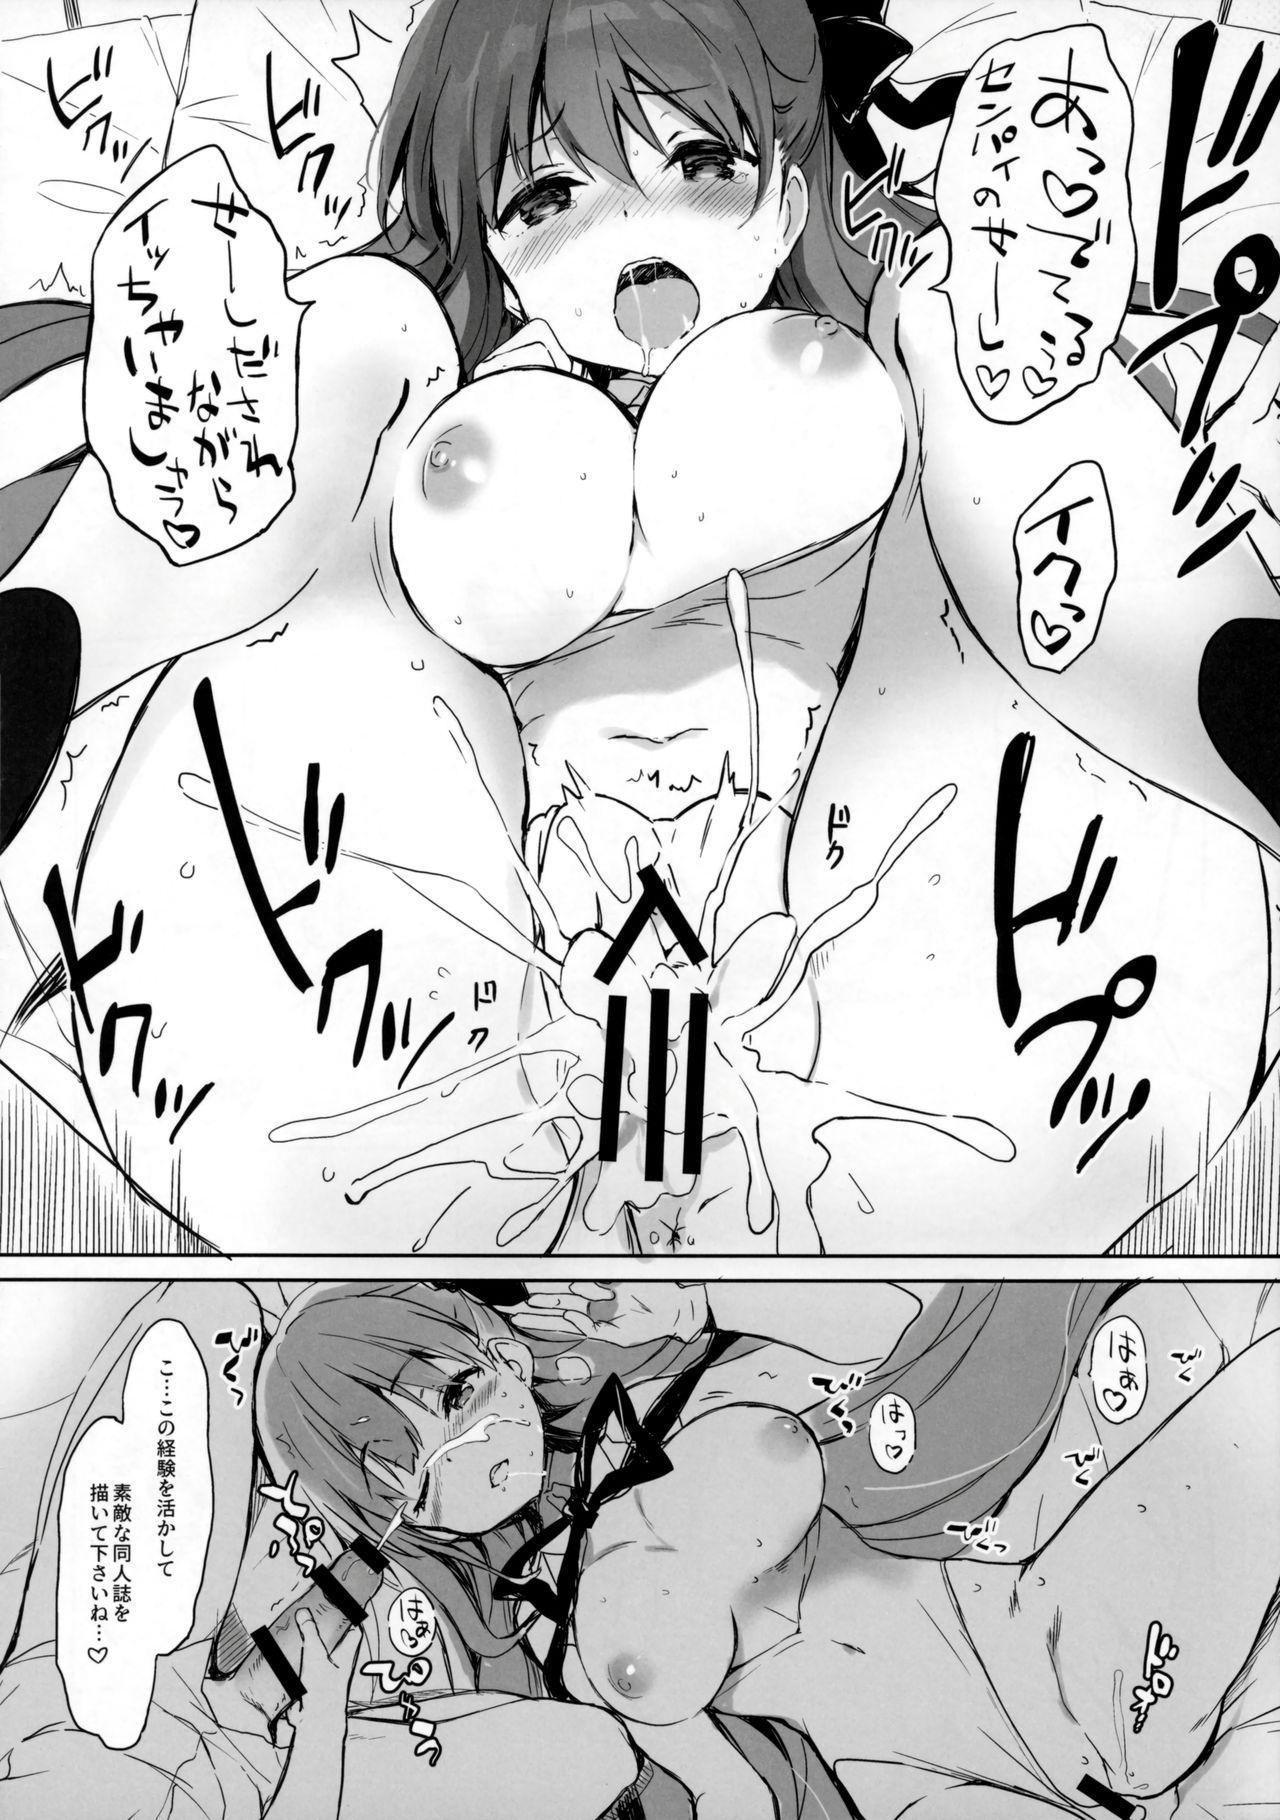 Koakumakei Wakusei Koukyoukyoku 11